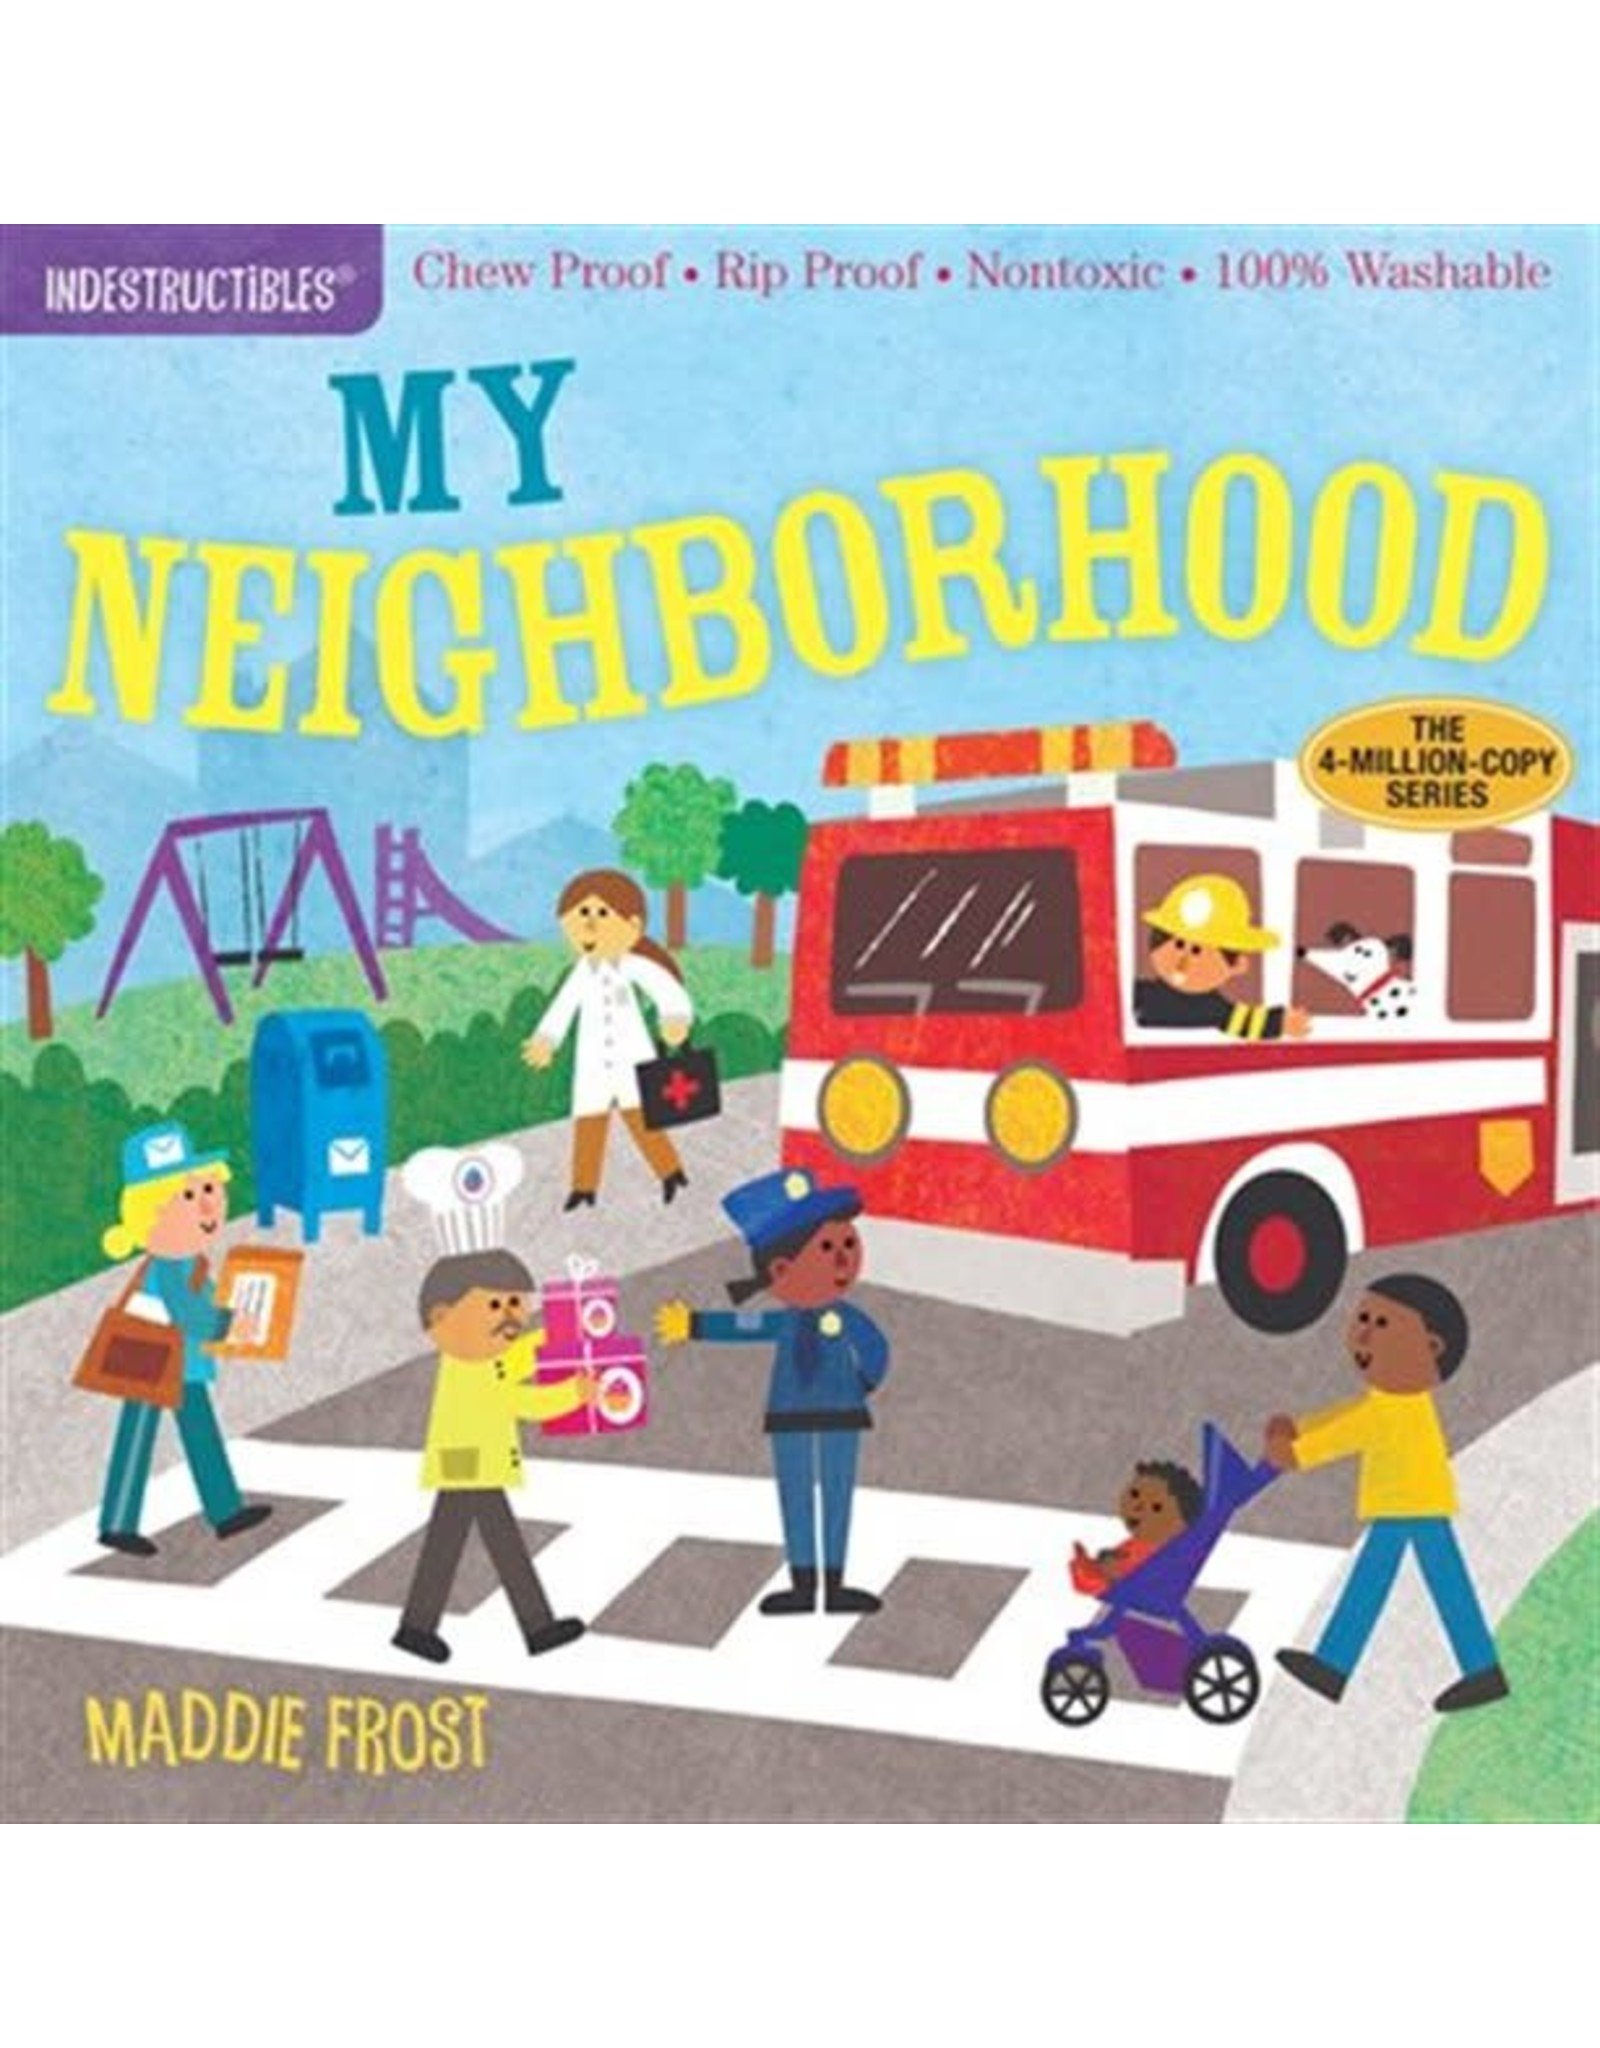 Indestructibles Book: My Neighborhood